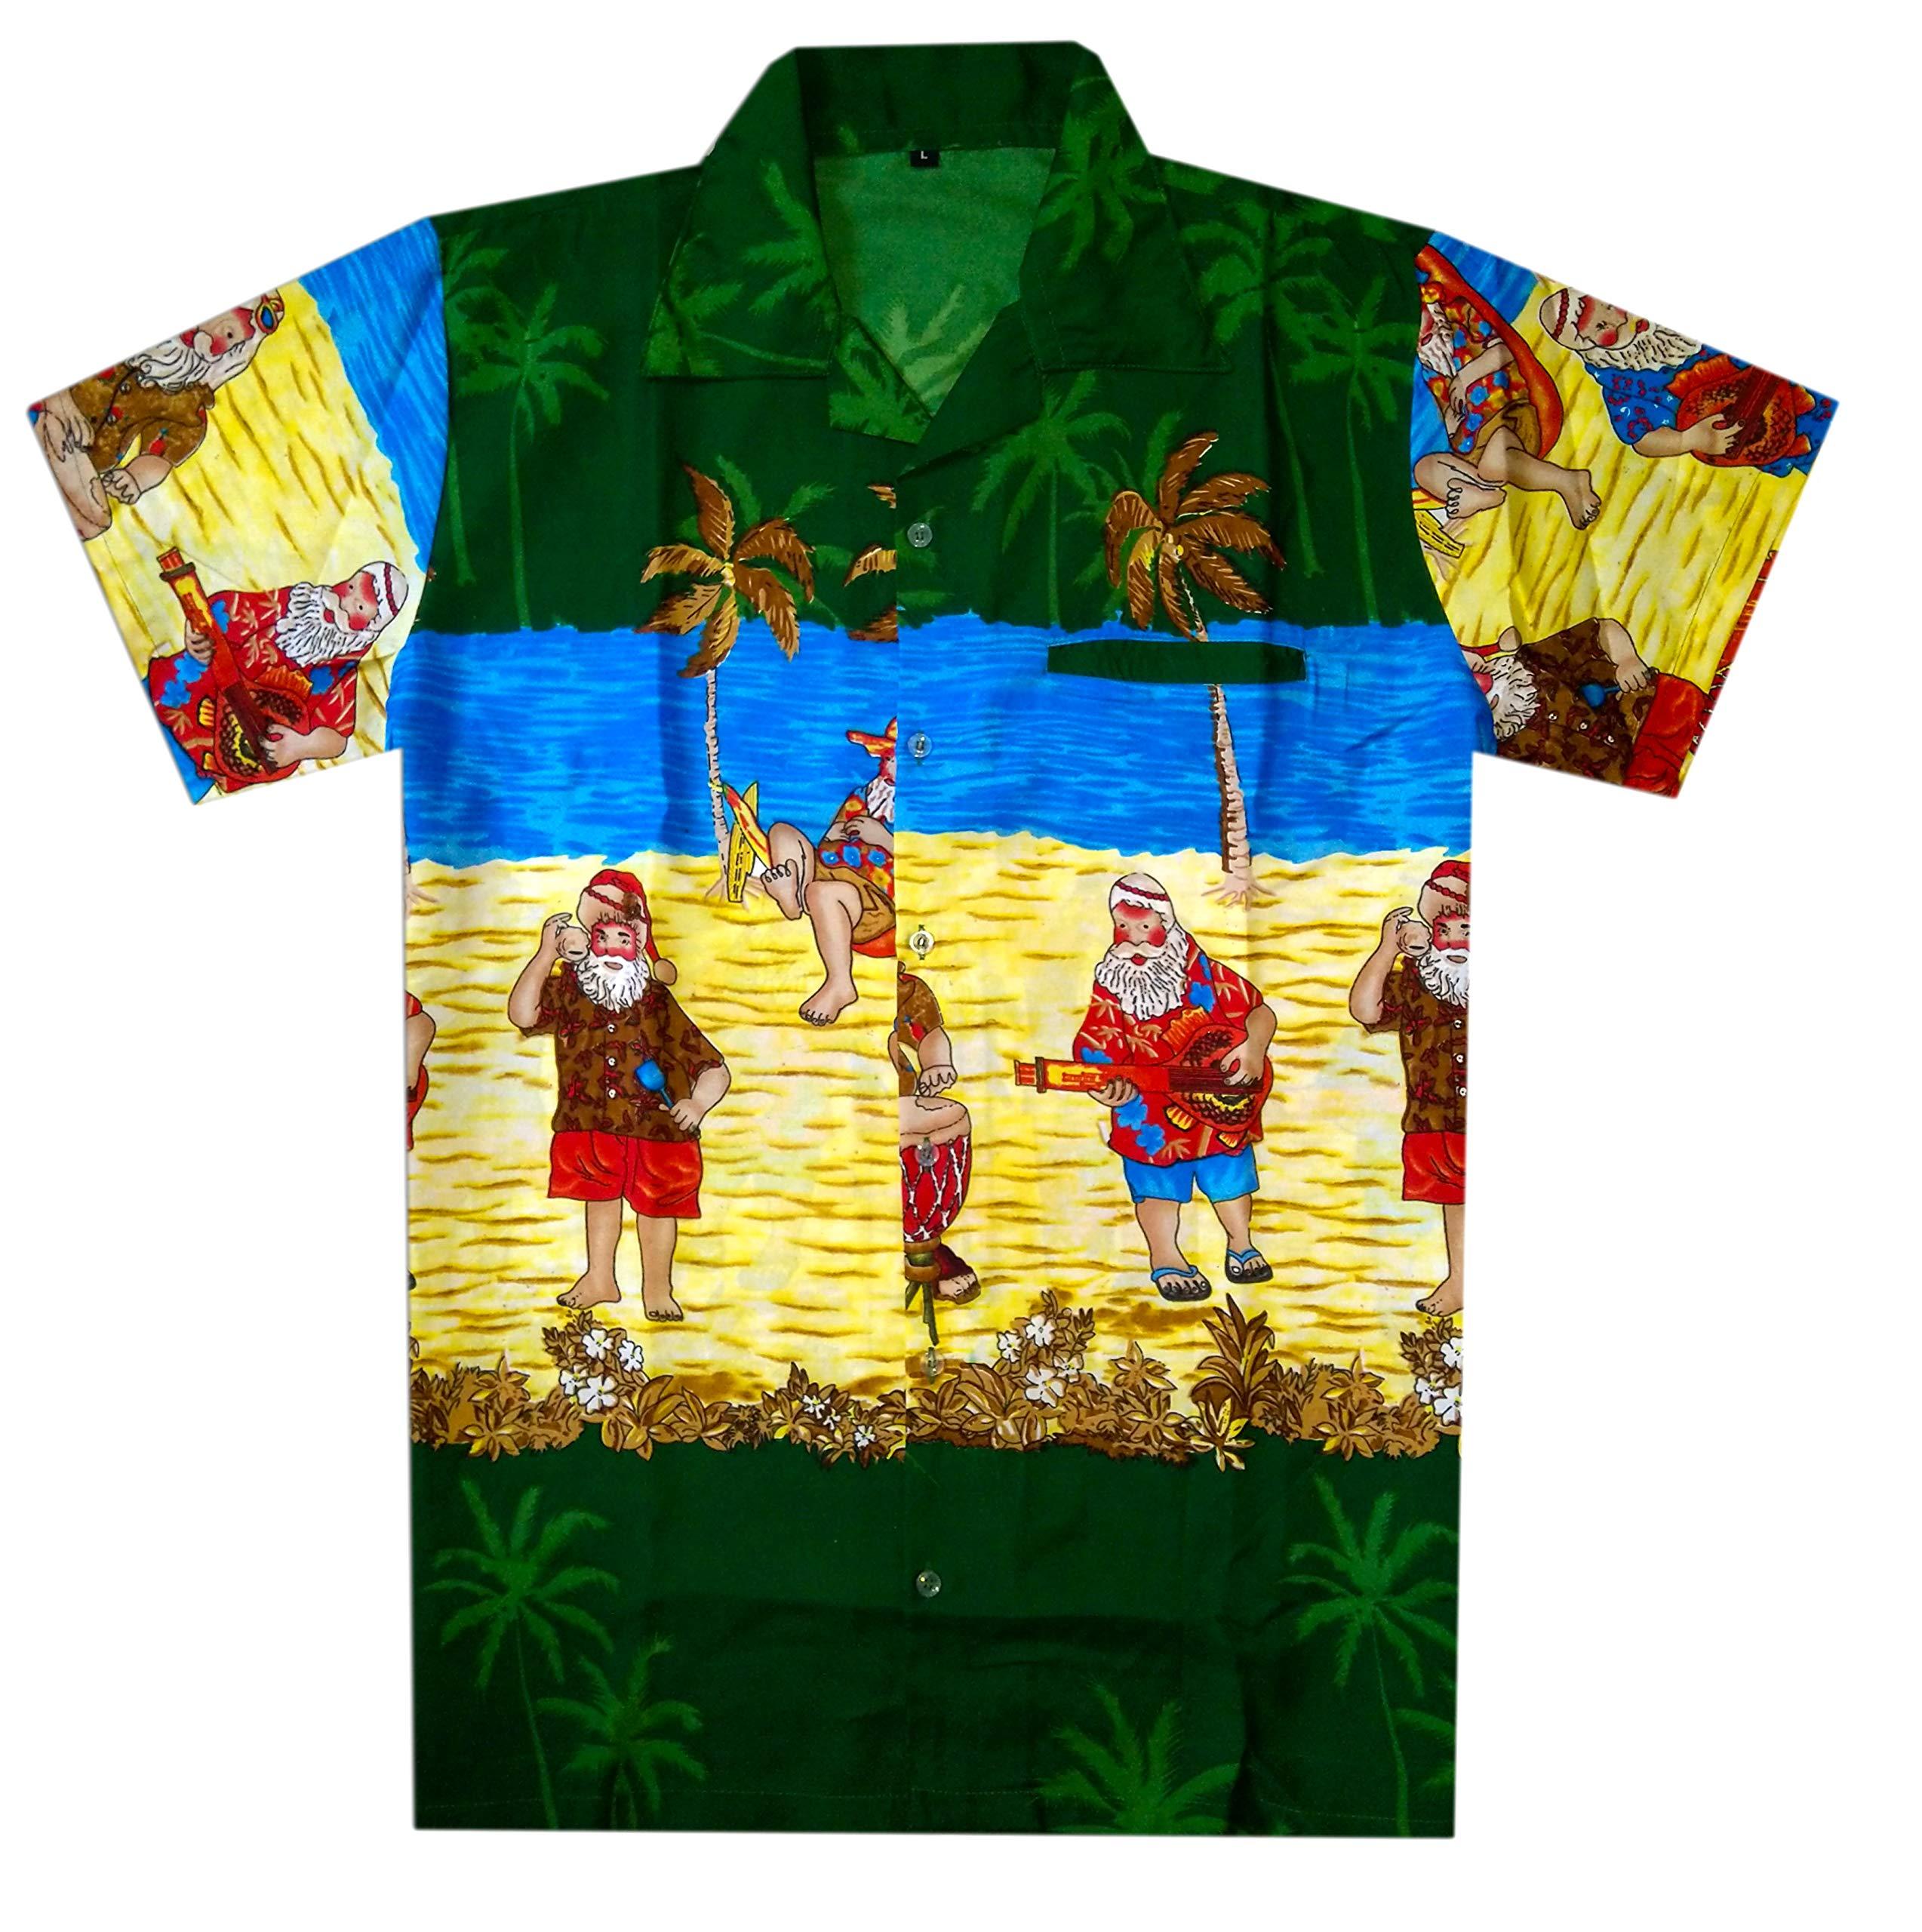 Christmas Hawaiian Shirt Womens.Virgin Crafts Christmas Hawaiian Shirt For Men Women Santa